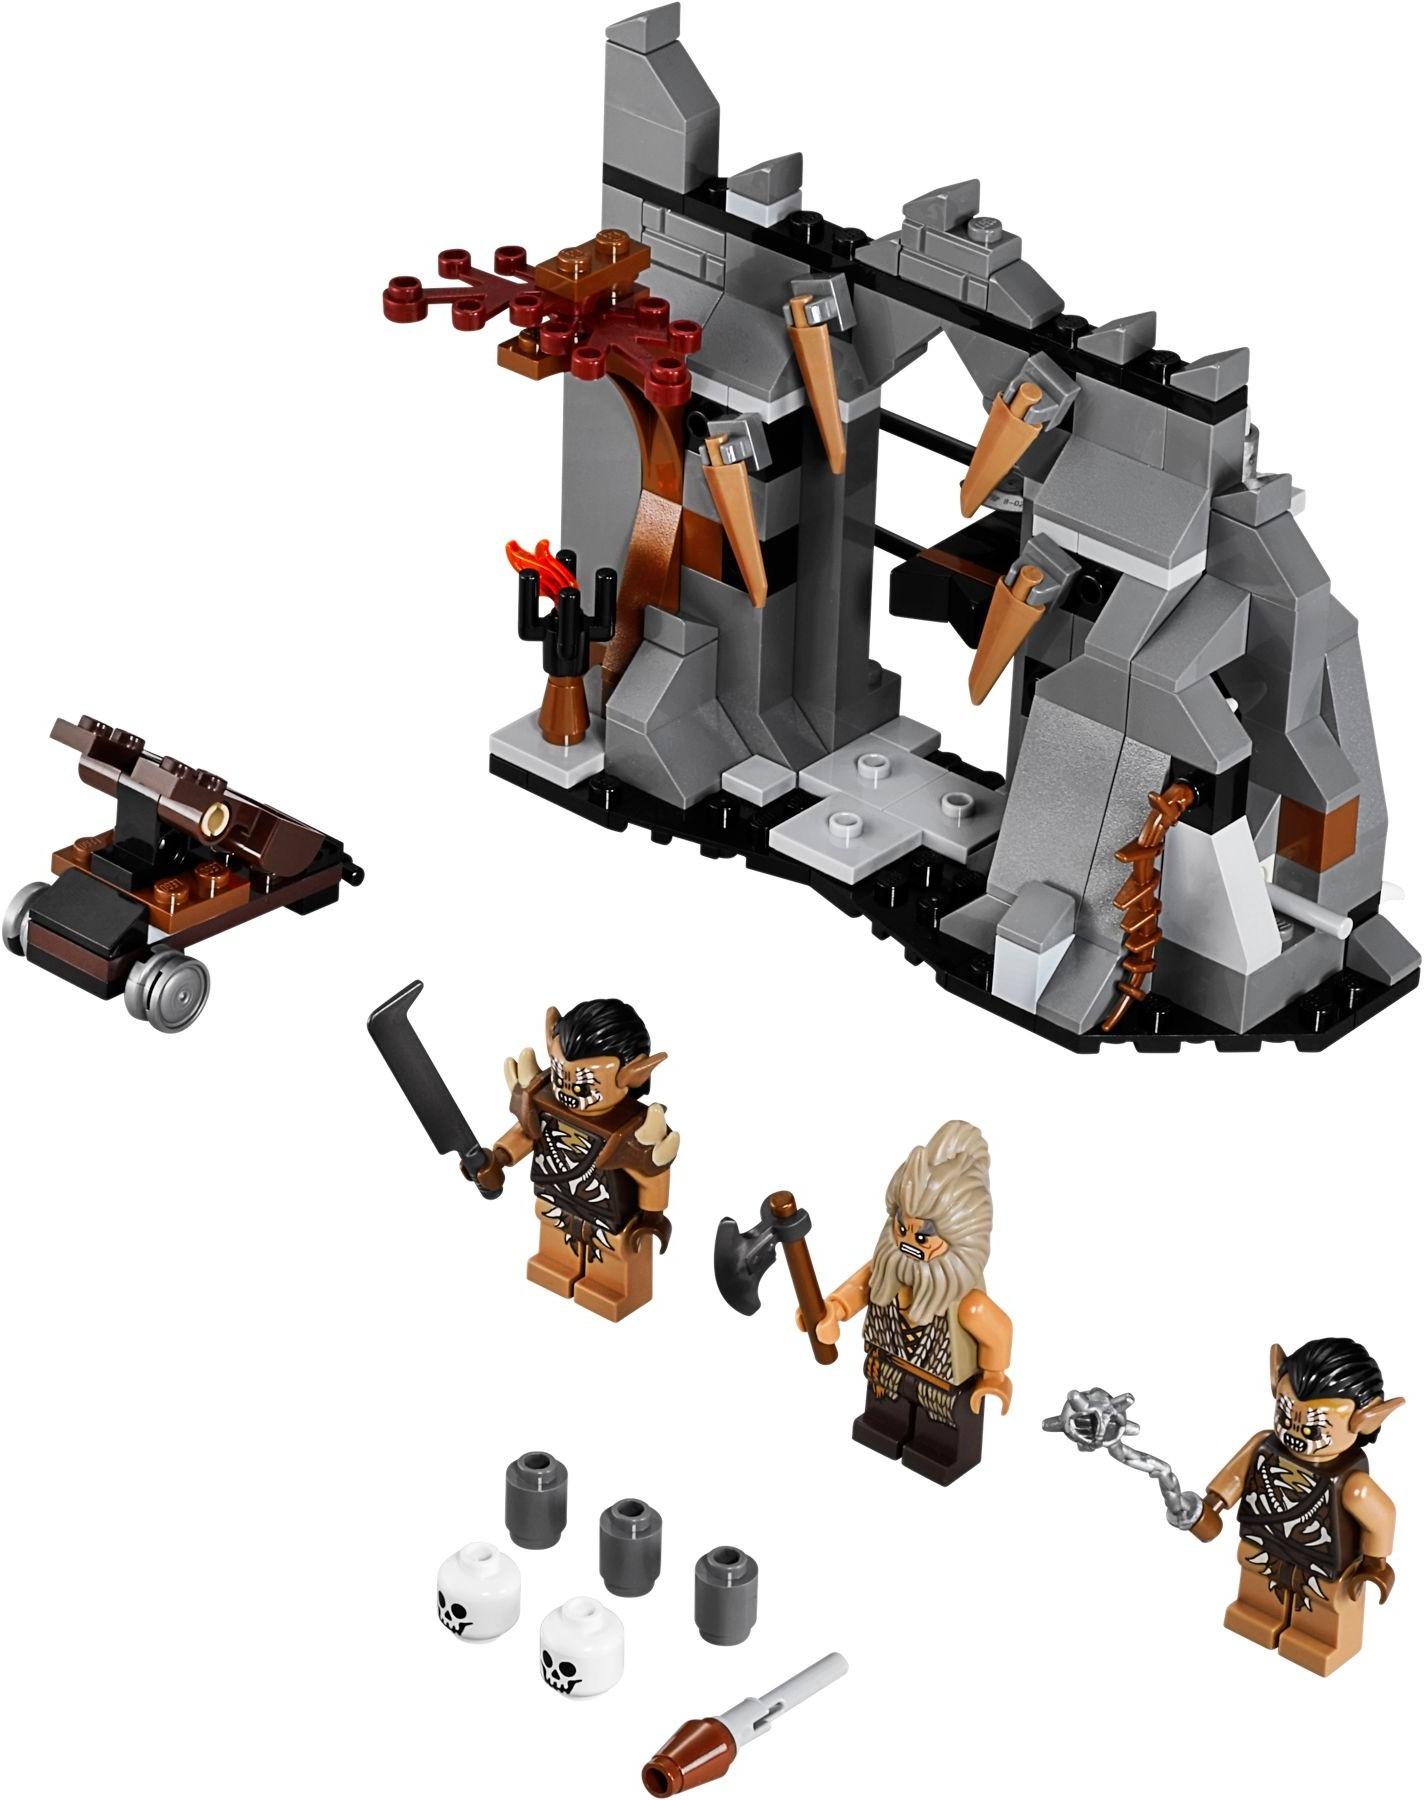 LEGO new PROMO POLYBAG Baggie set 30213 HOBBIT LORD RINGS Gandalf Dol Guldur Map